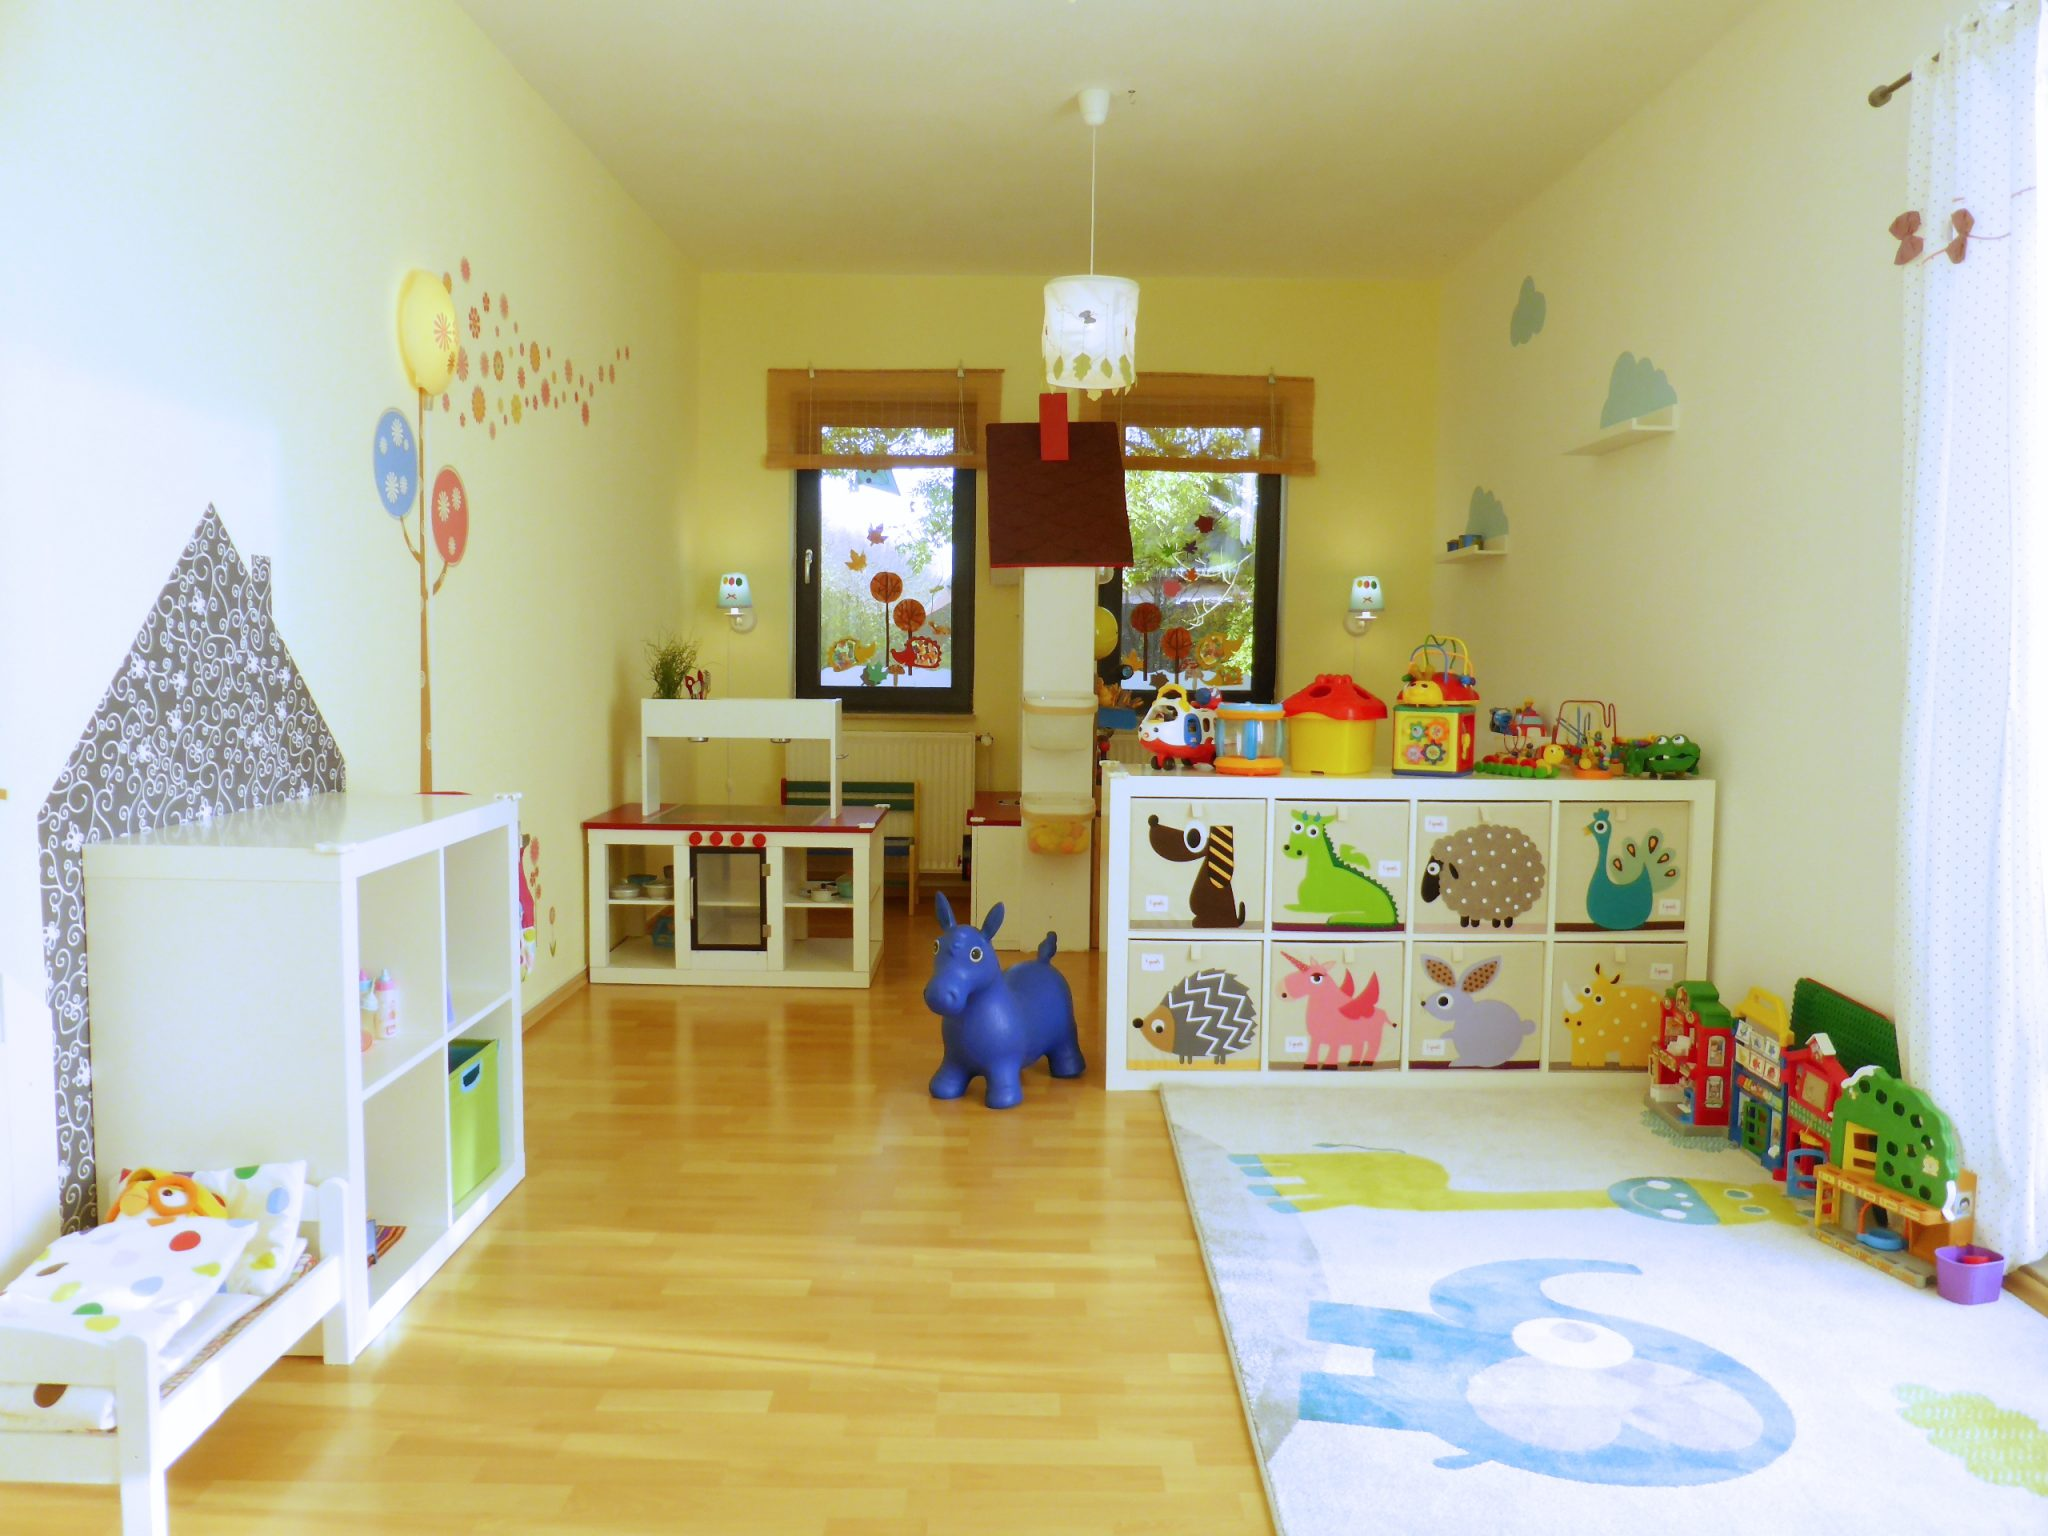 Spielzimmer 23 Kita Kid Zone Kinderbetreuung - Kita Kid Zone Kinderbetreuung für 0-3 Jahre in Jersbek